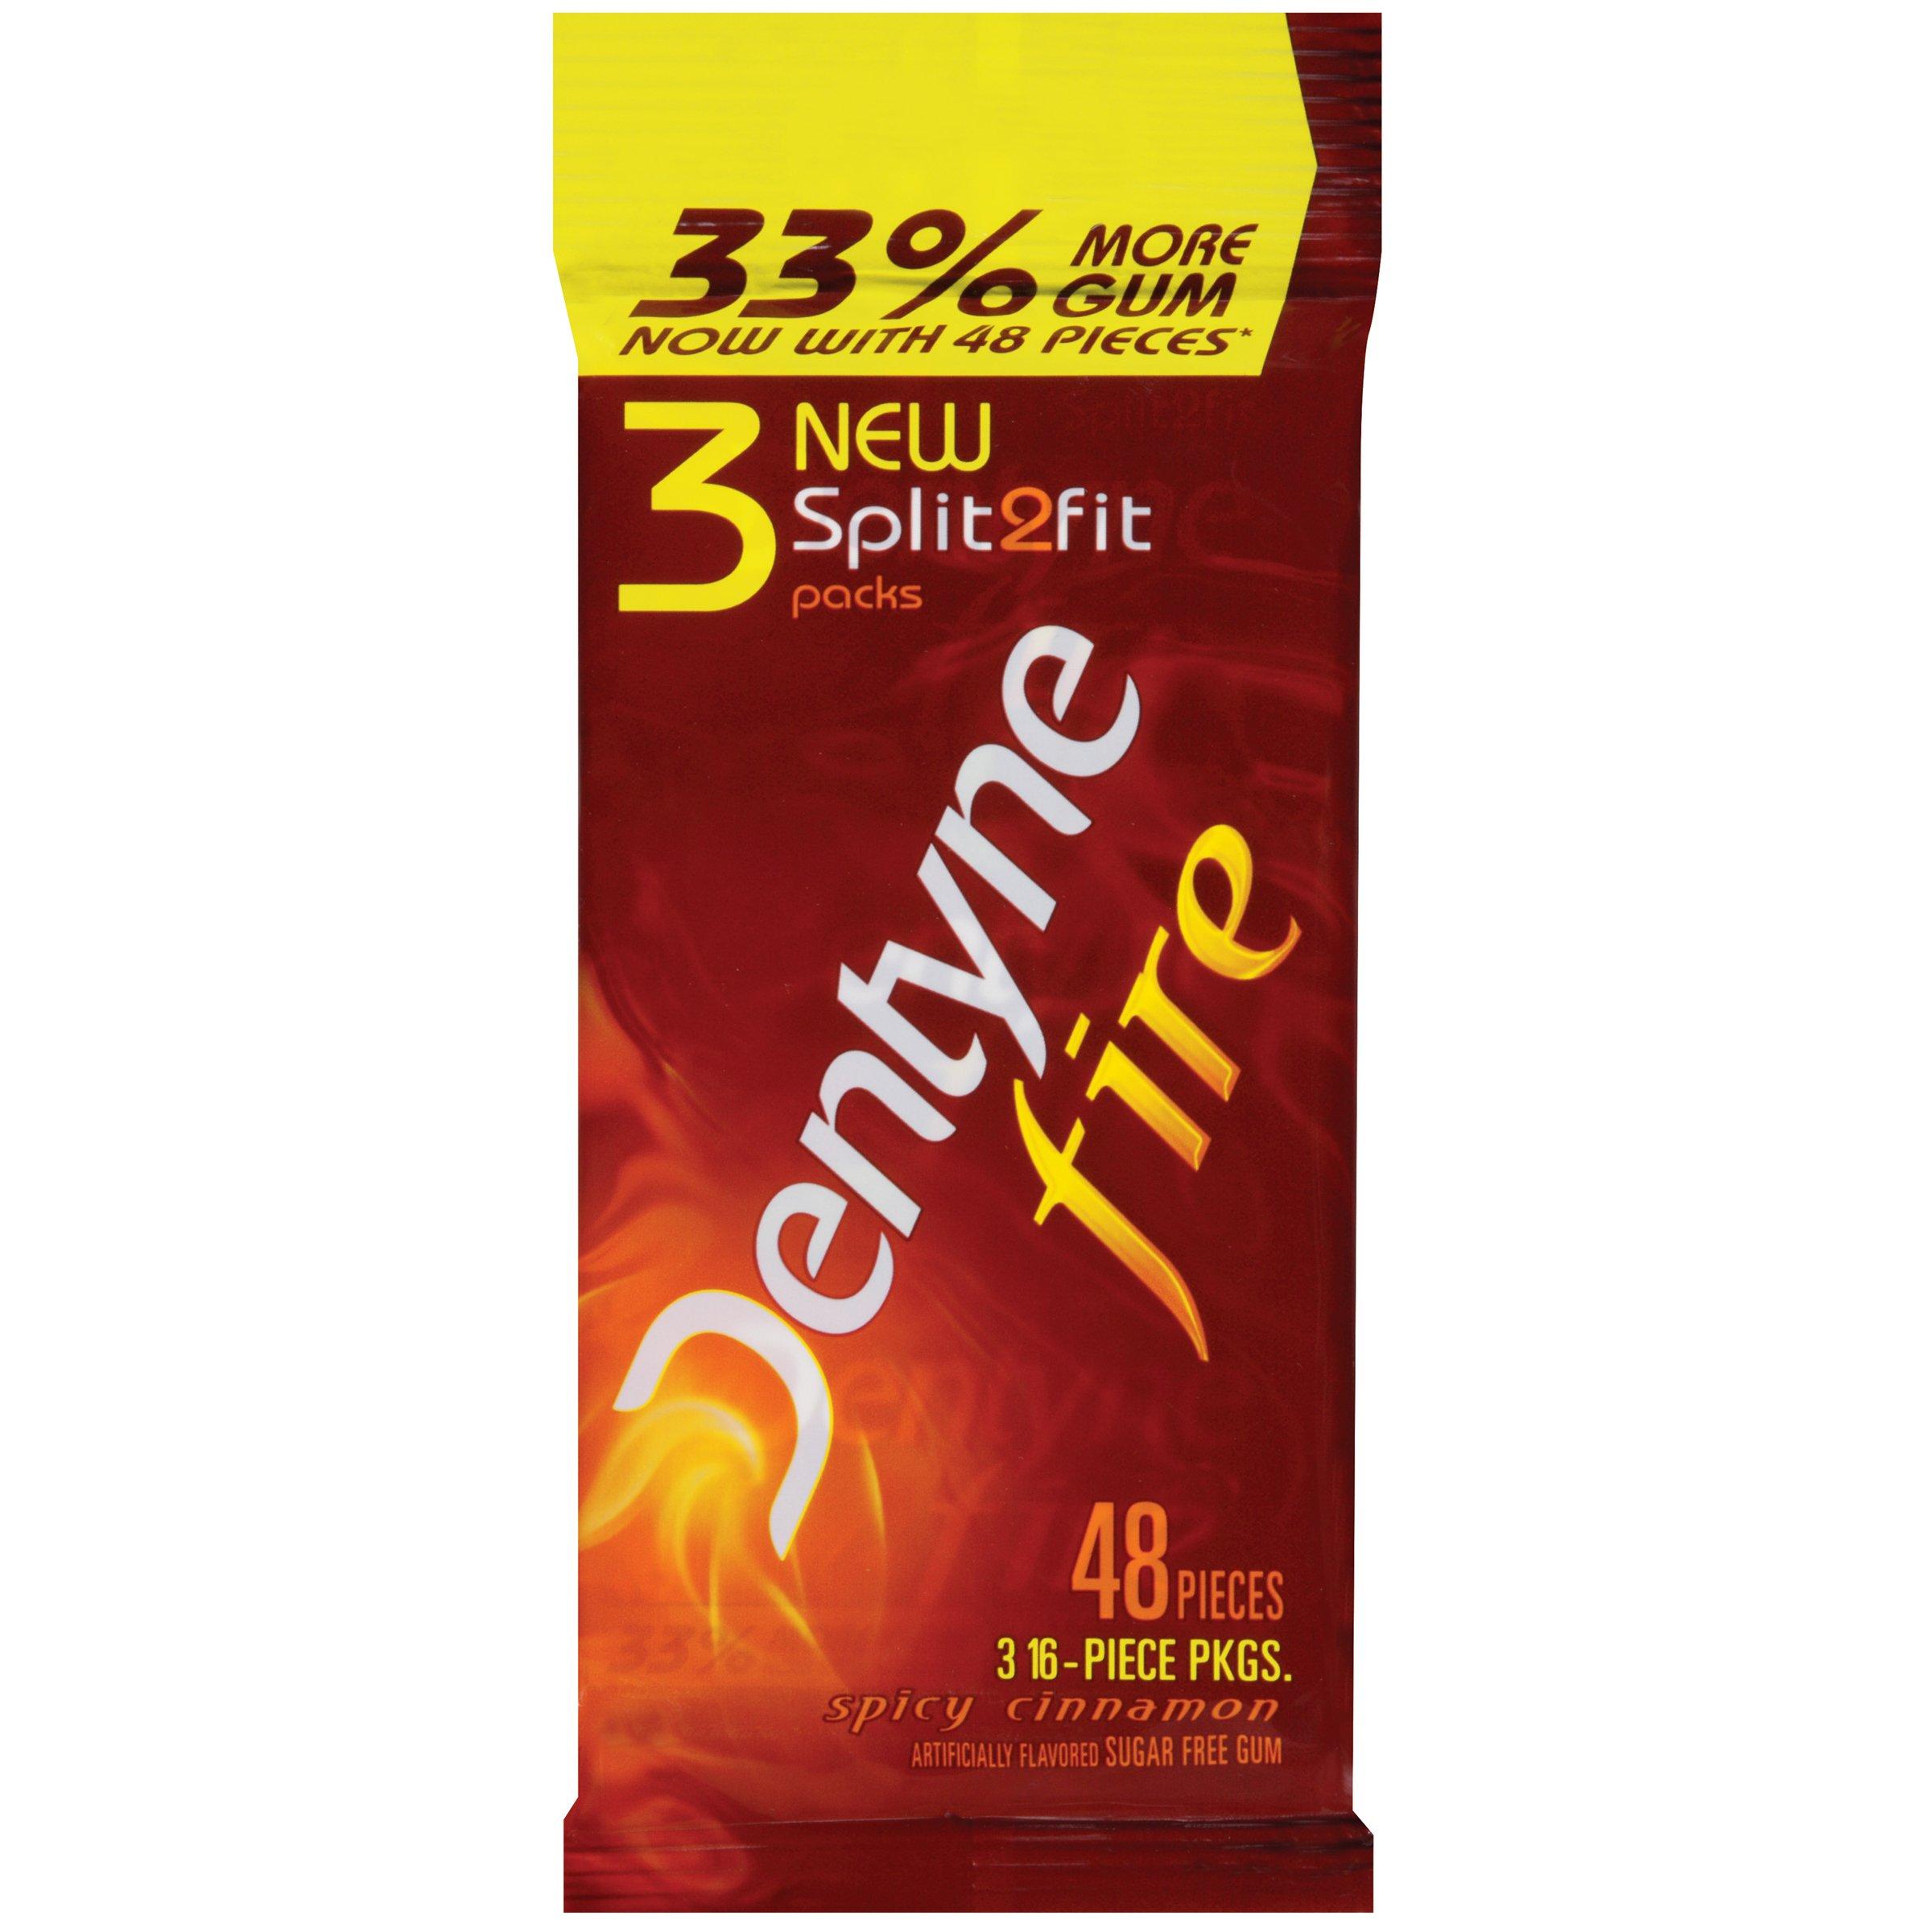 Dentyne Fire Sugar Free Gum, Spicy Cinnamon, 3 x 16 Piece Sleeve (Pack of 20)